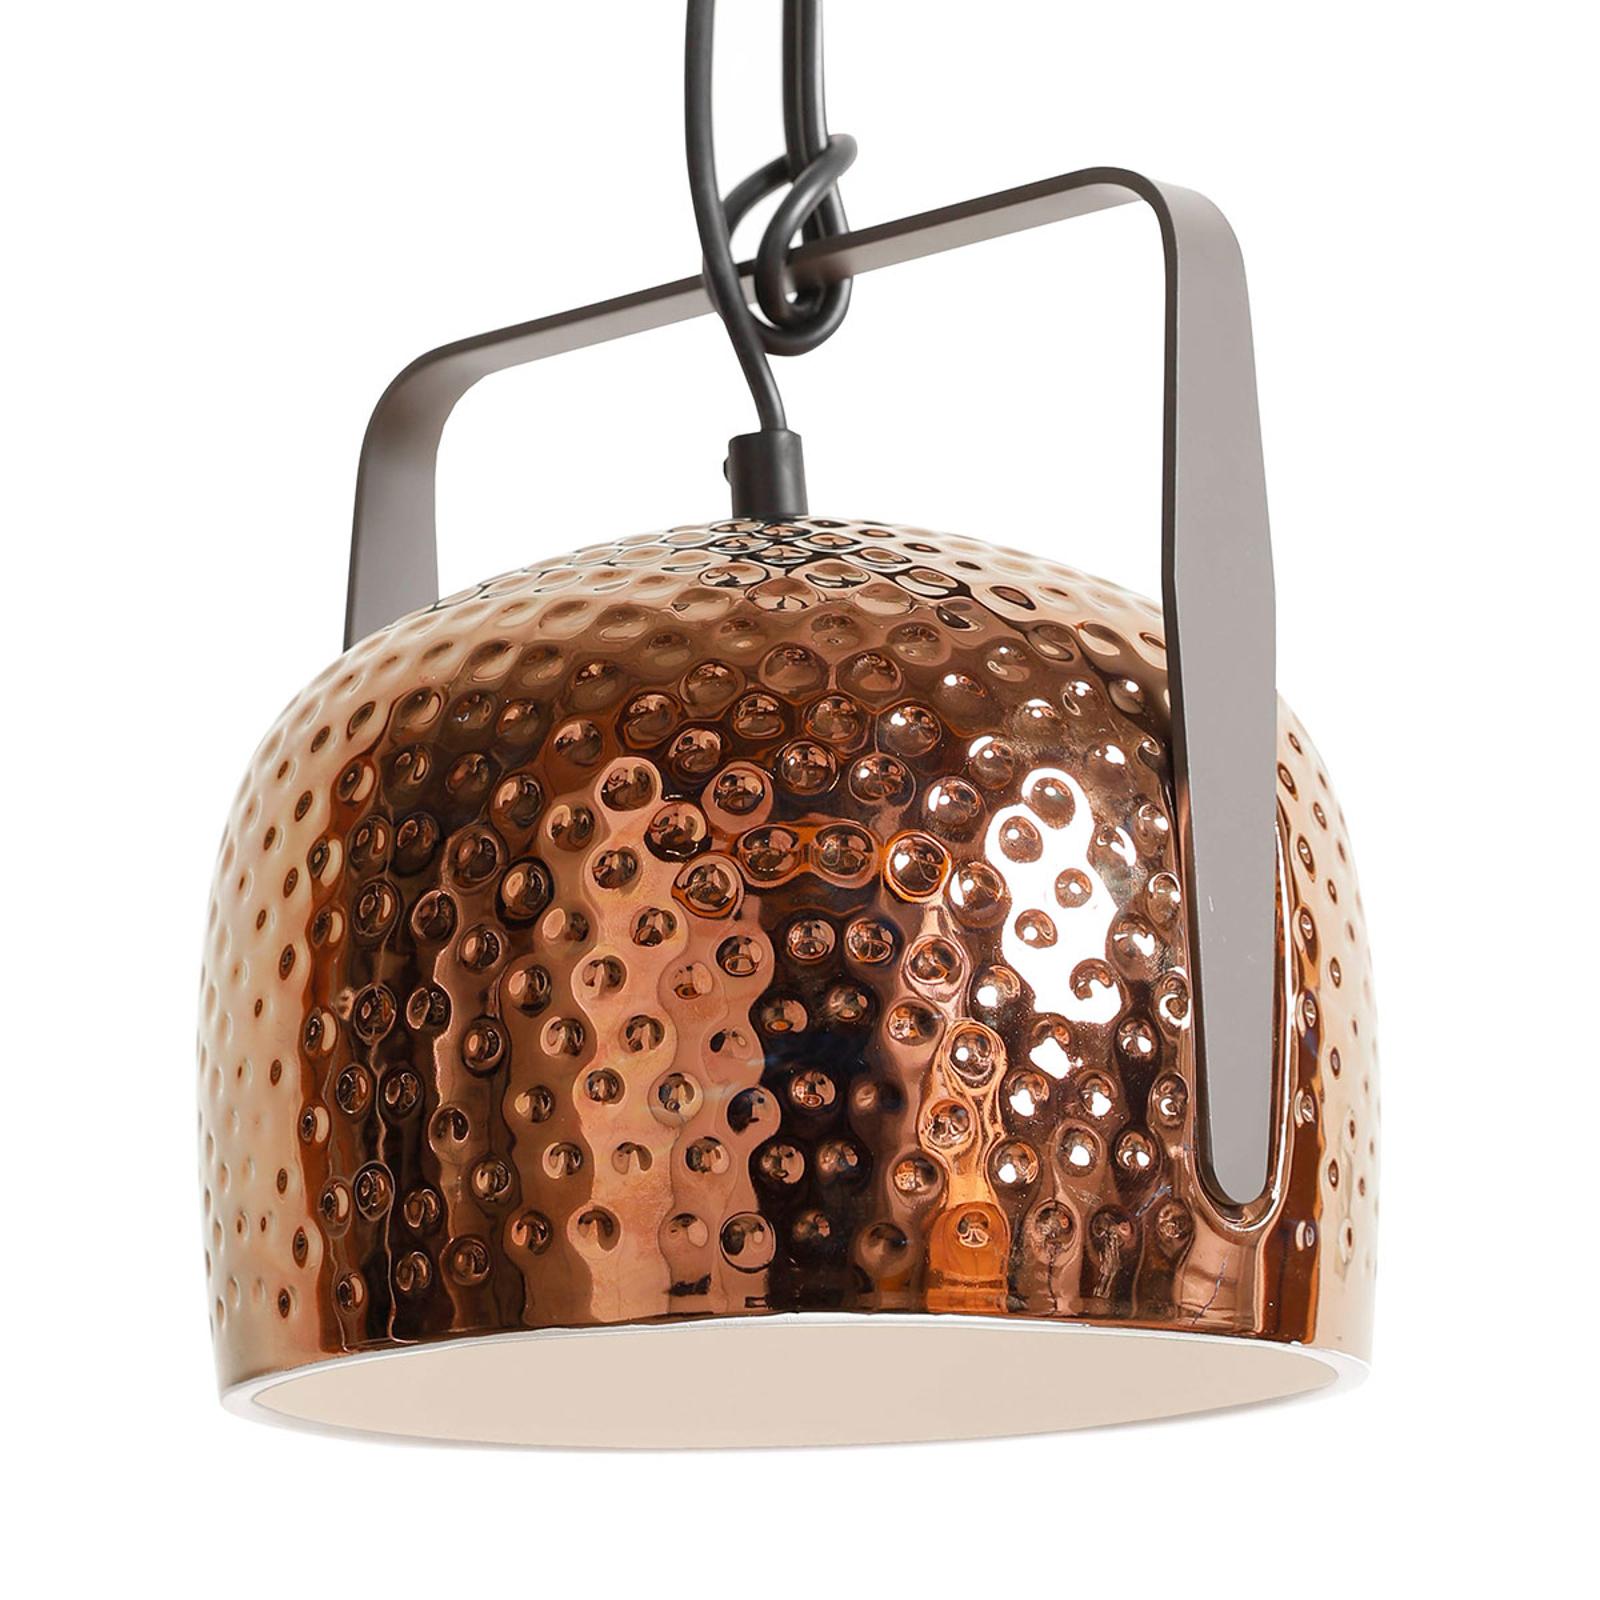 Karman Bag - bronzen hanglamp, 32 cm